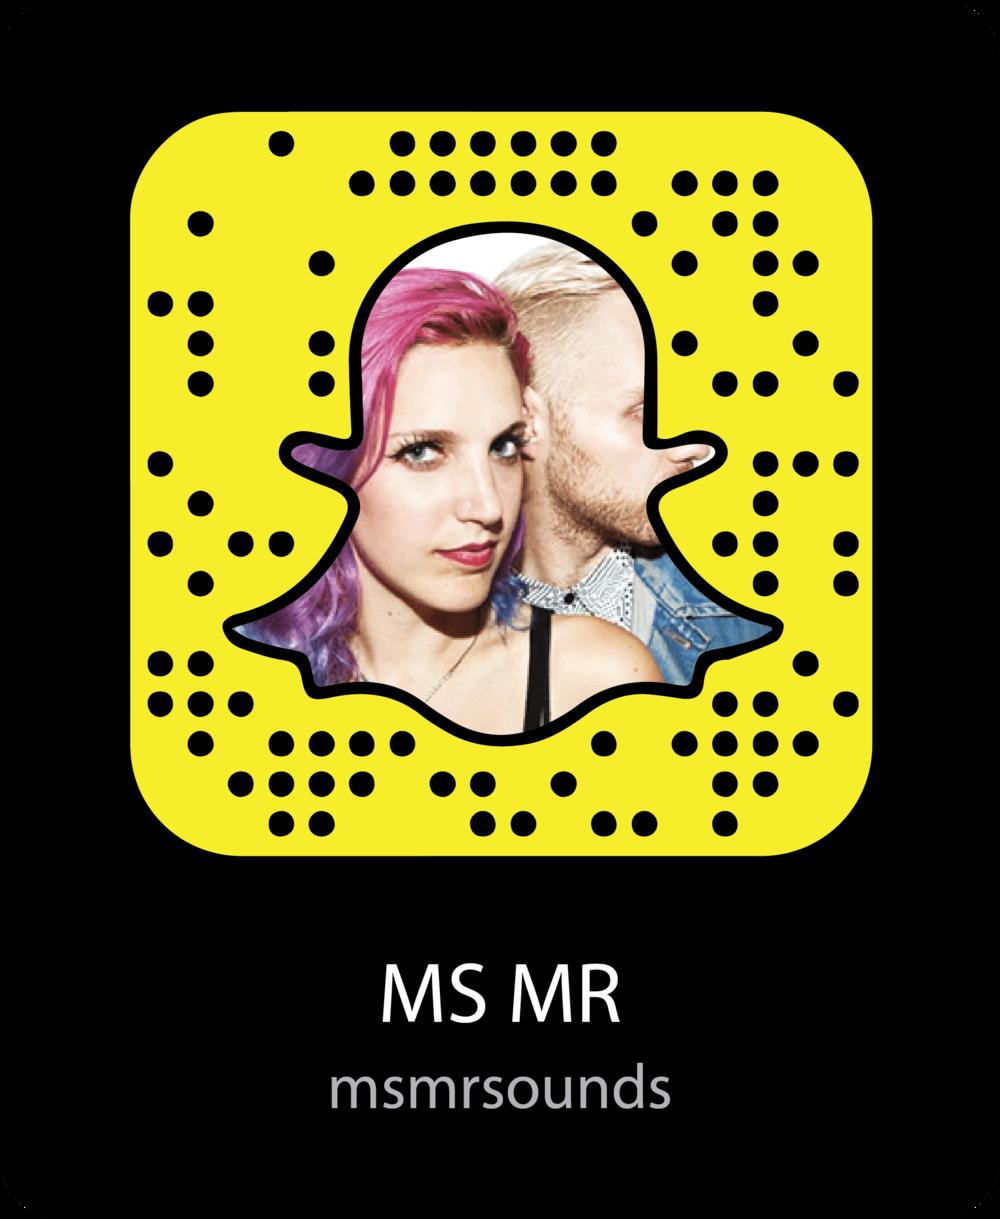 ms-mr-msmr-celebrity-snapchat-snapcode